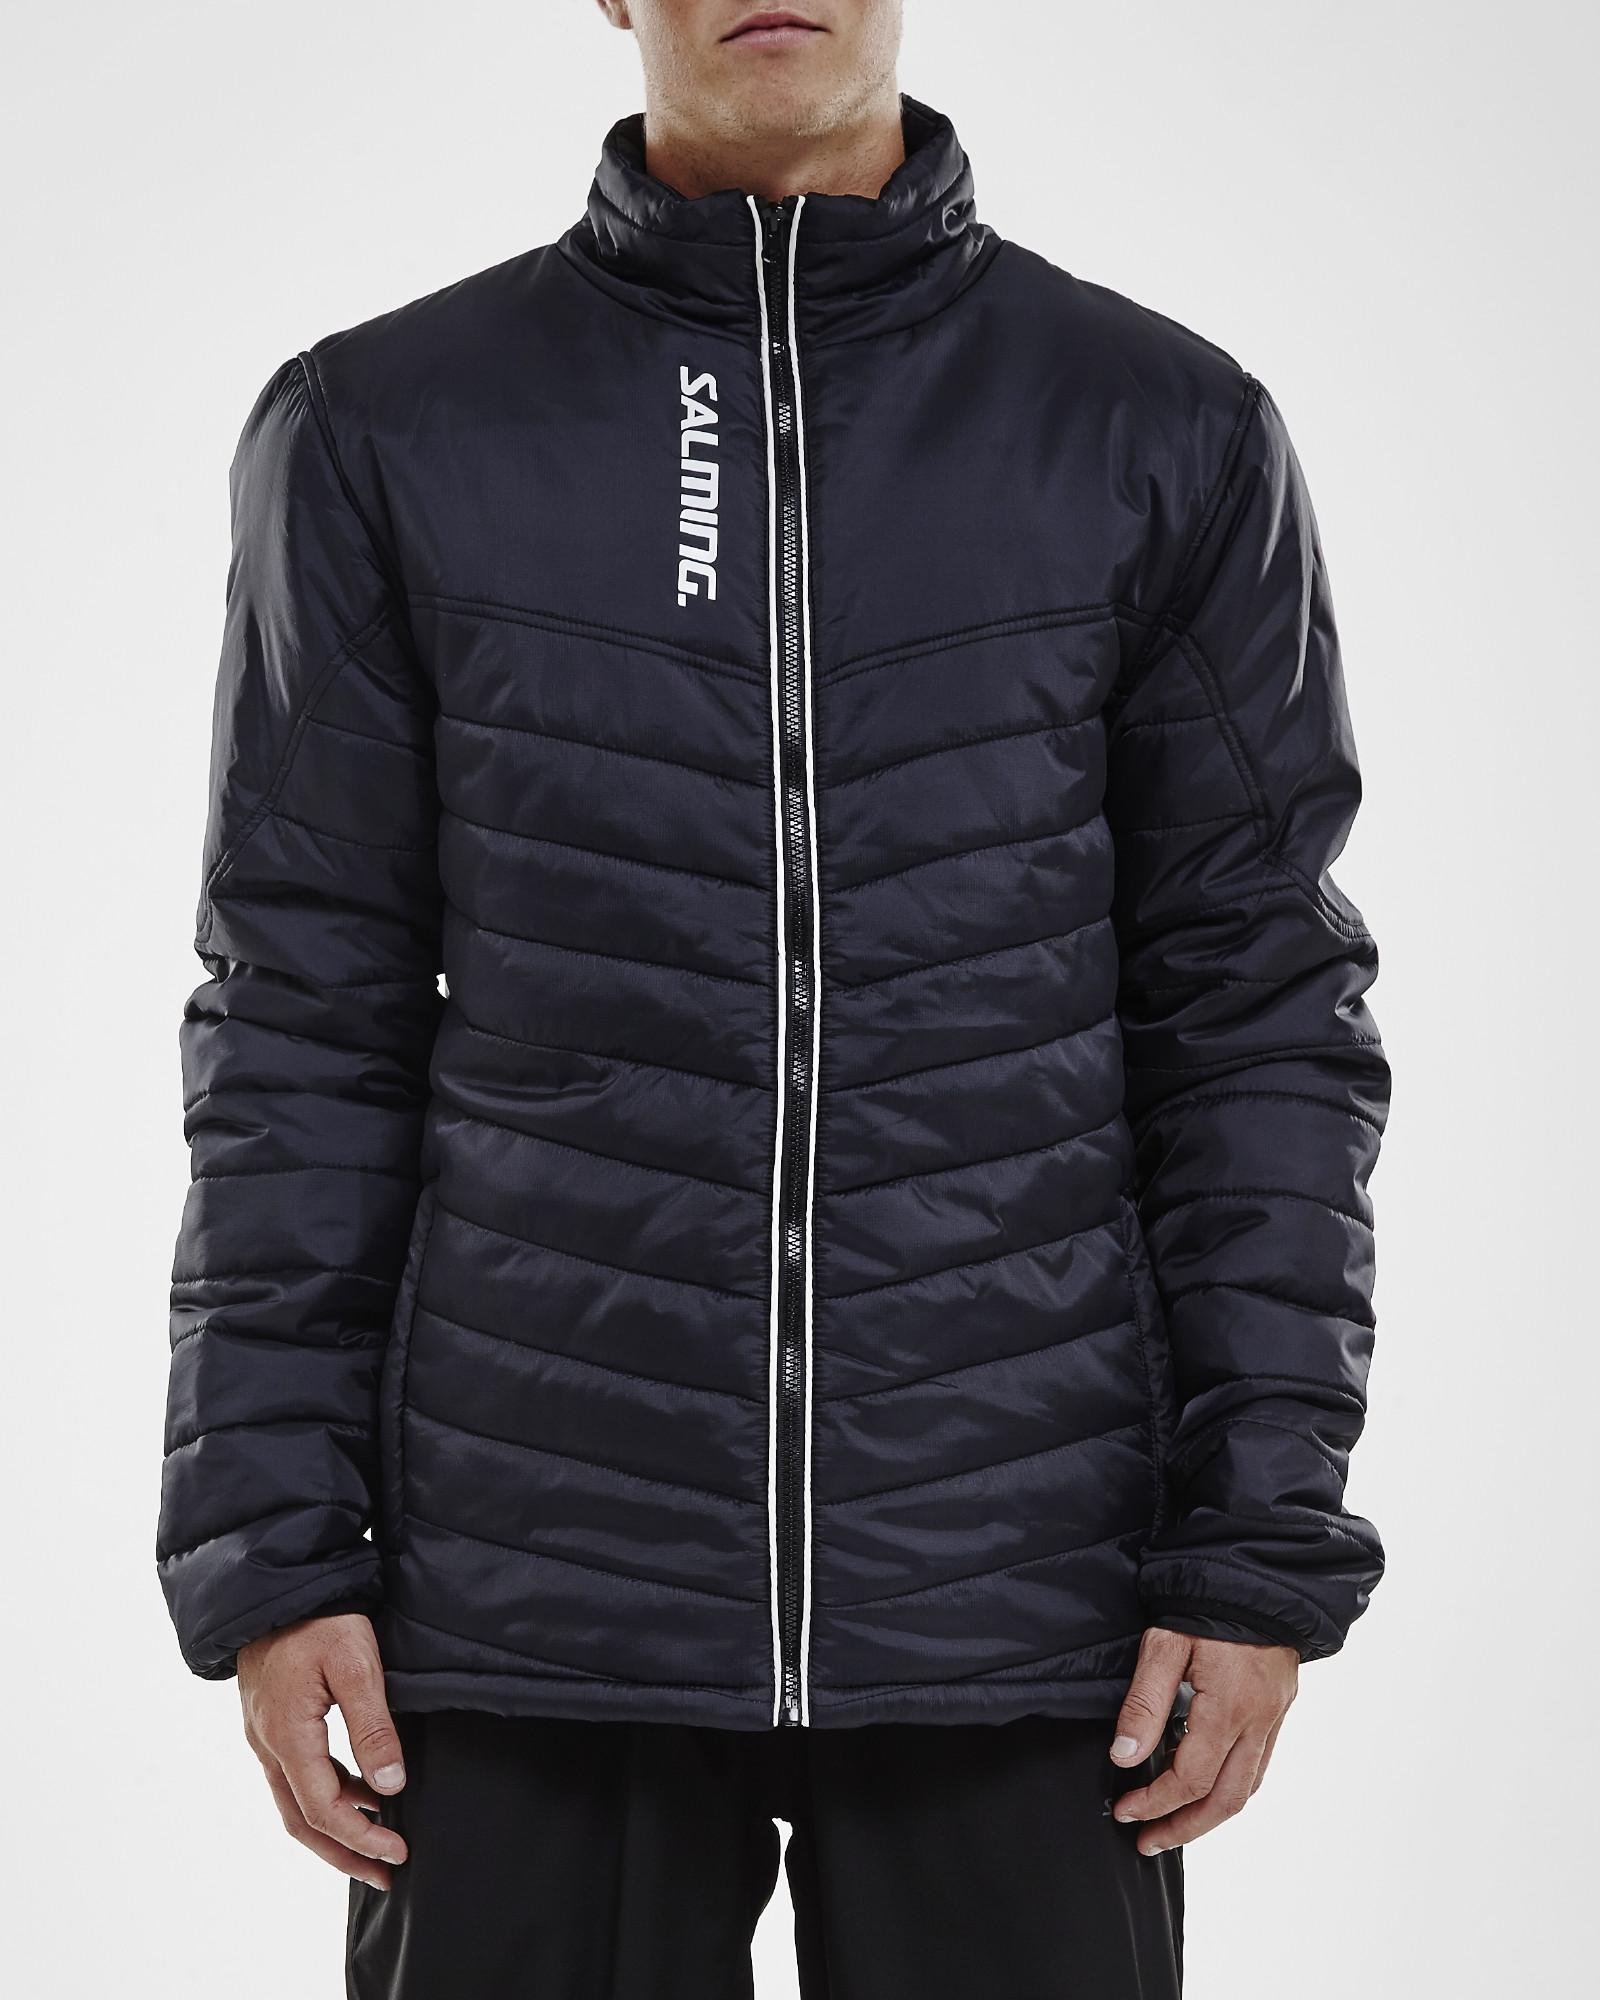 Salming League Jacket S, černá